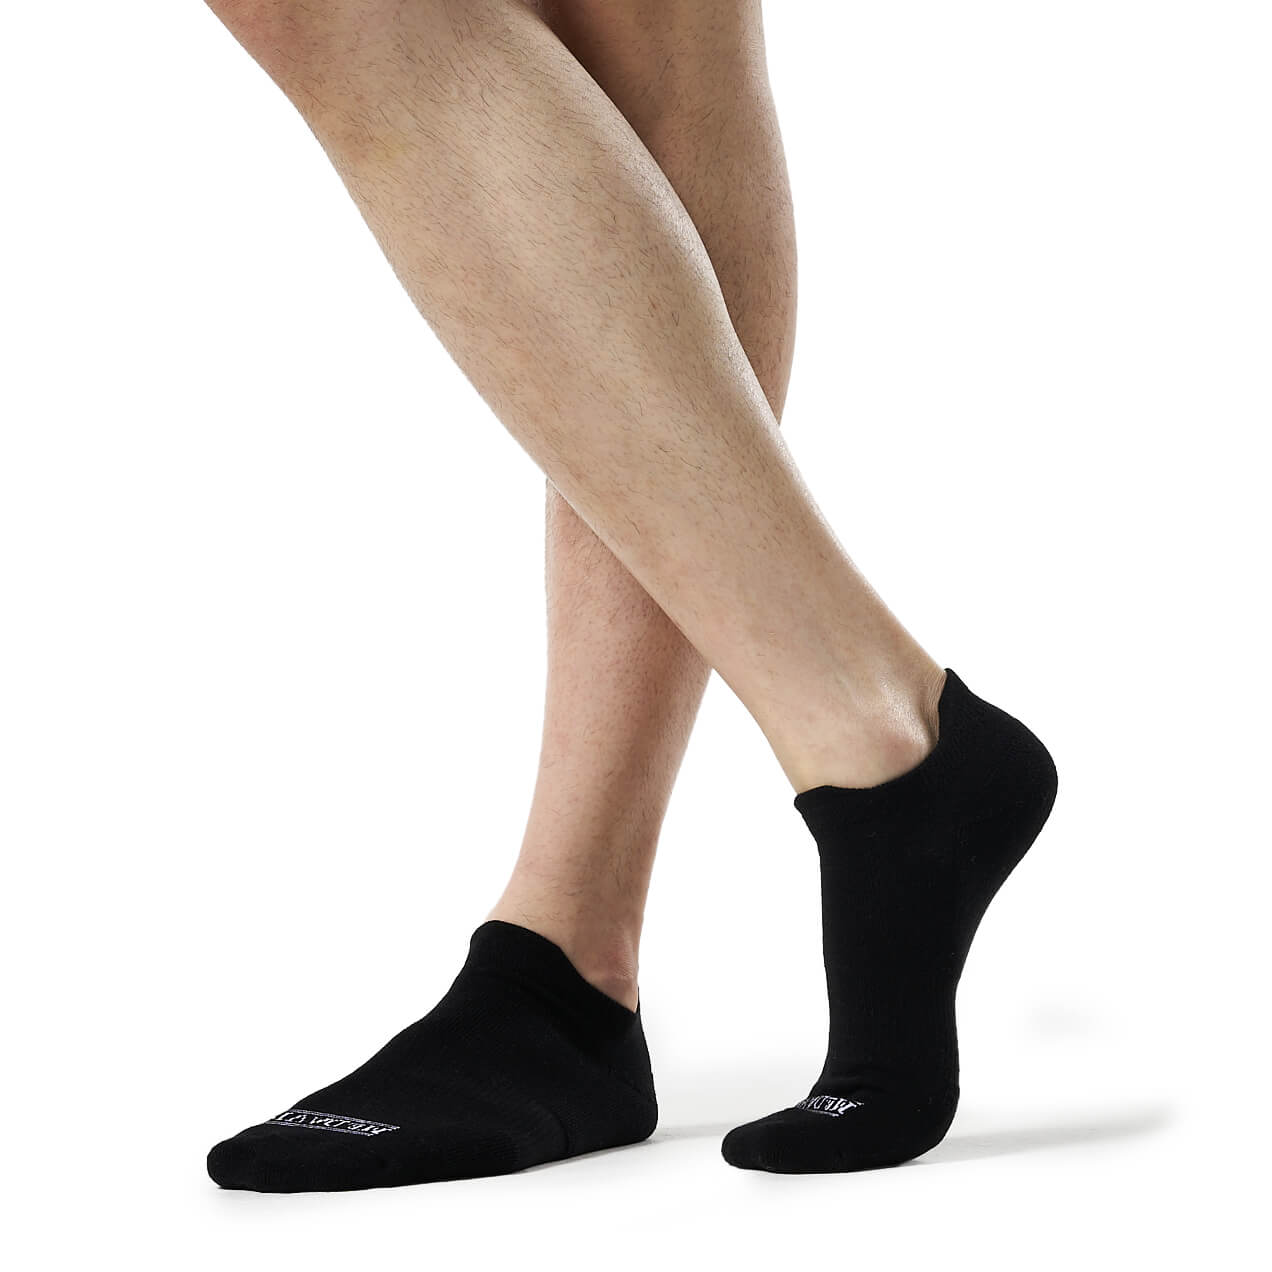 Best Black Athletic Sock